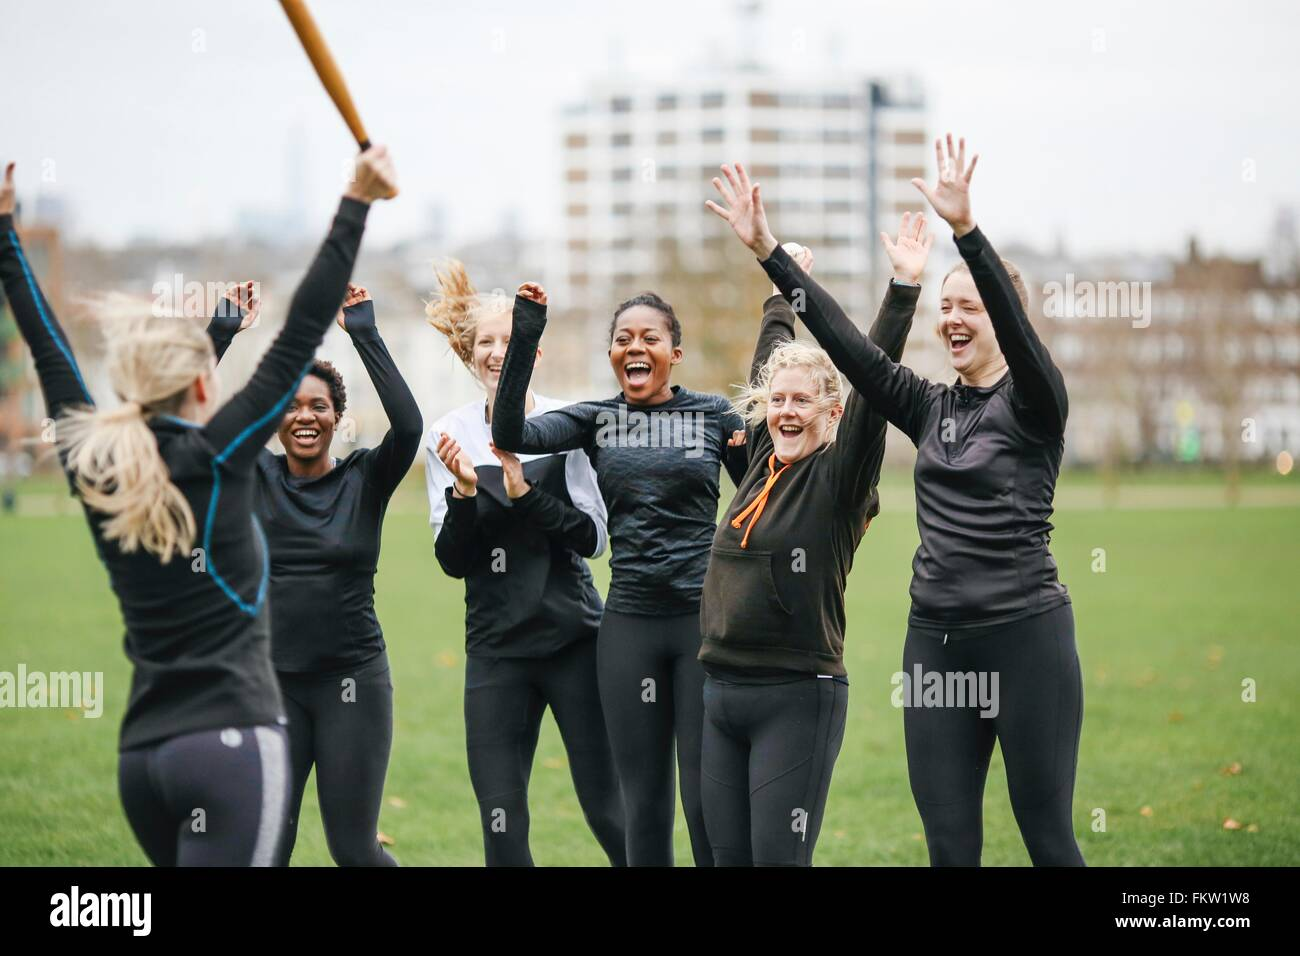 Female rounders team celebrating at rounders match - Stock Image